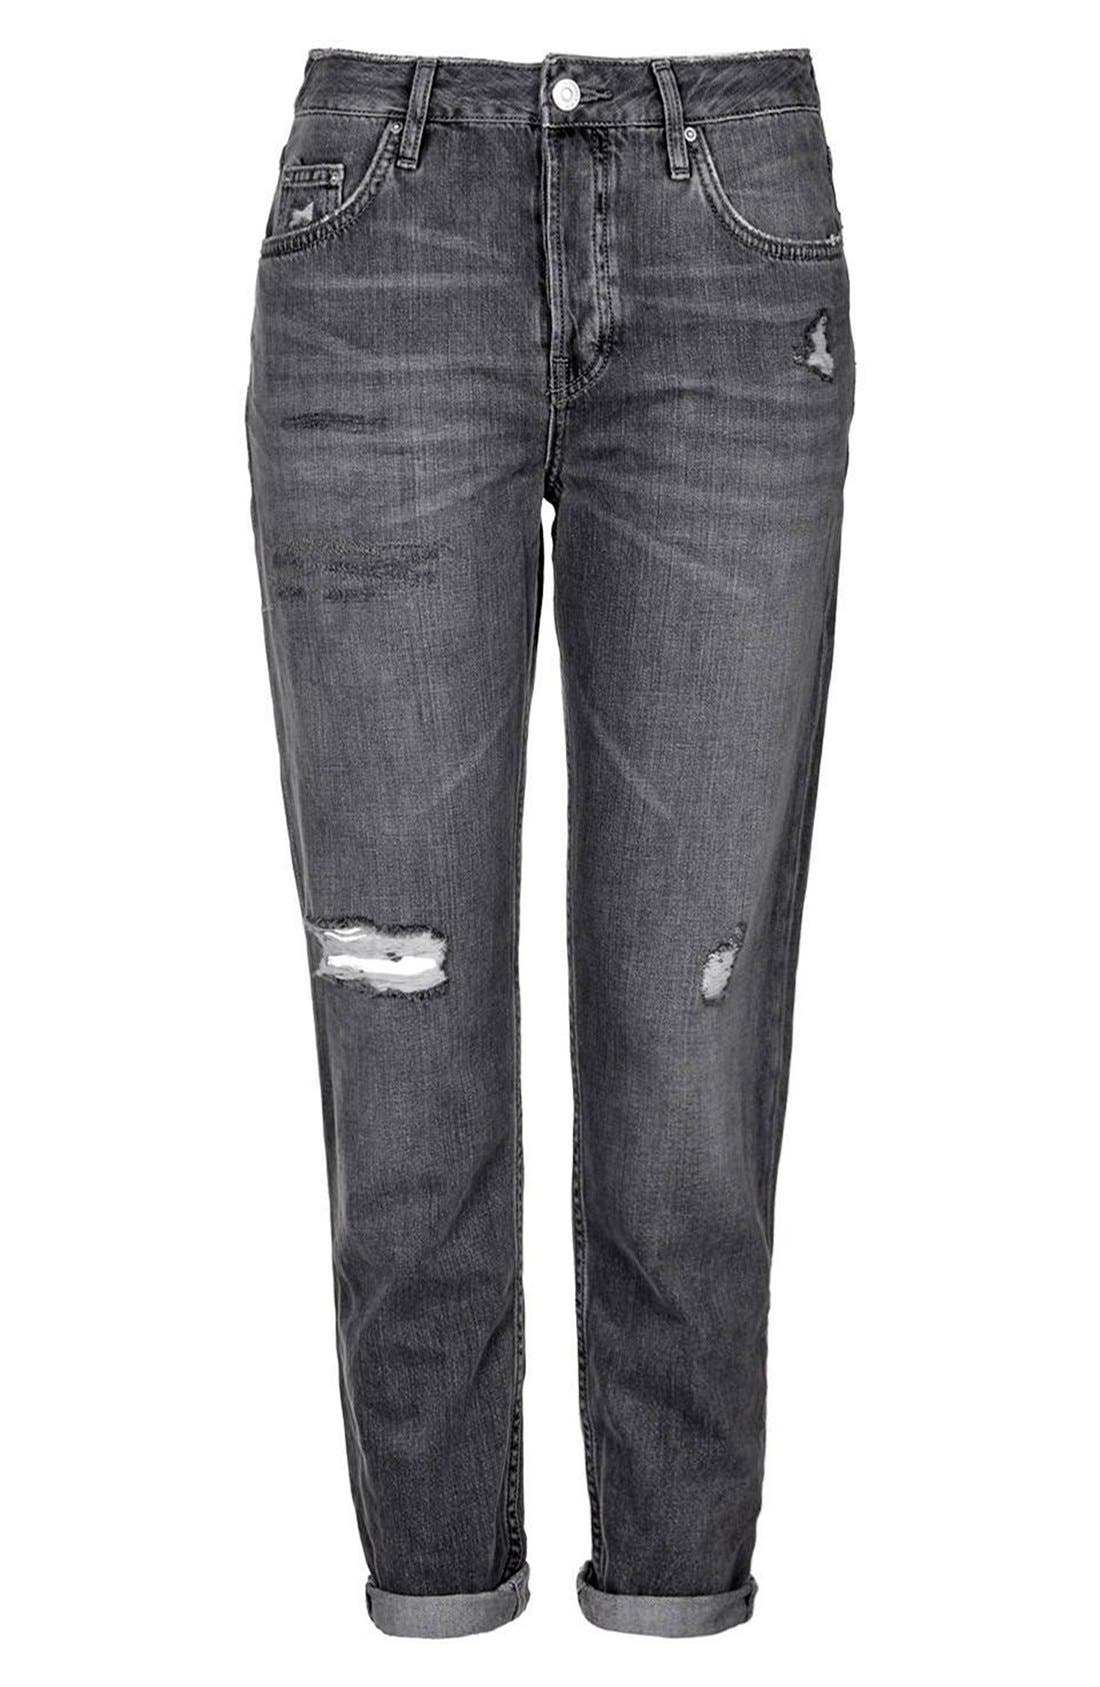 Alternate Image 4  - Topshop Moto 'Hayden' Ripped Boyfriend Jeans (Petite)